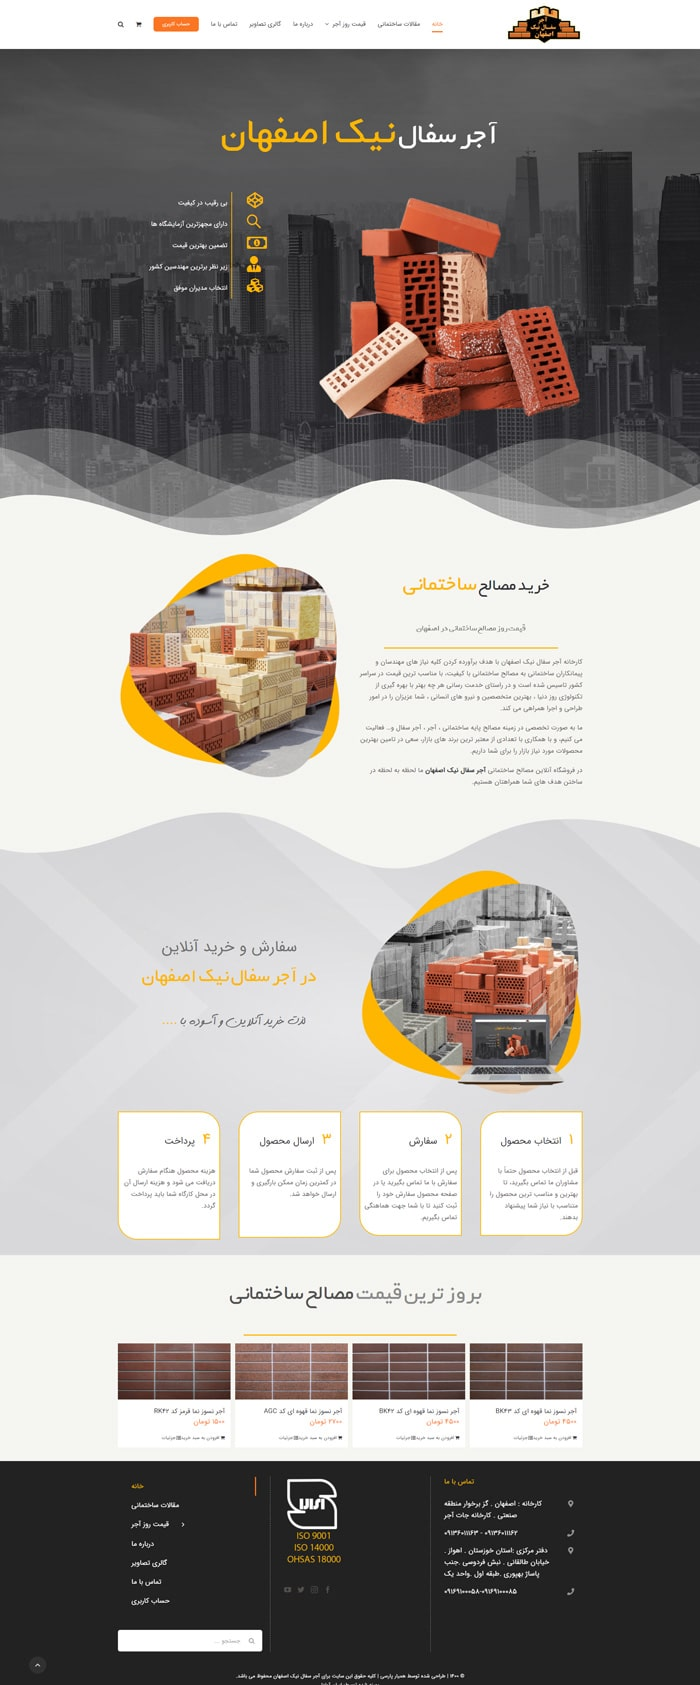 طراحی سایت آجر سفال نیک اصفهان